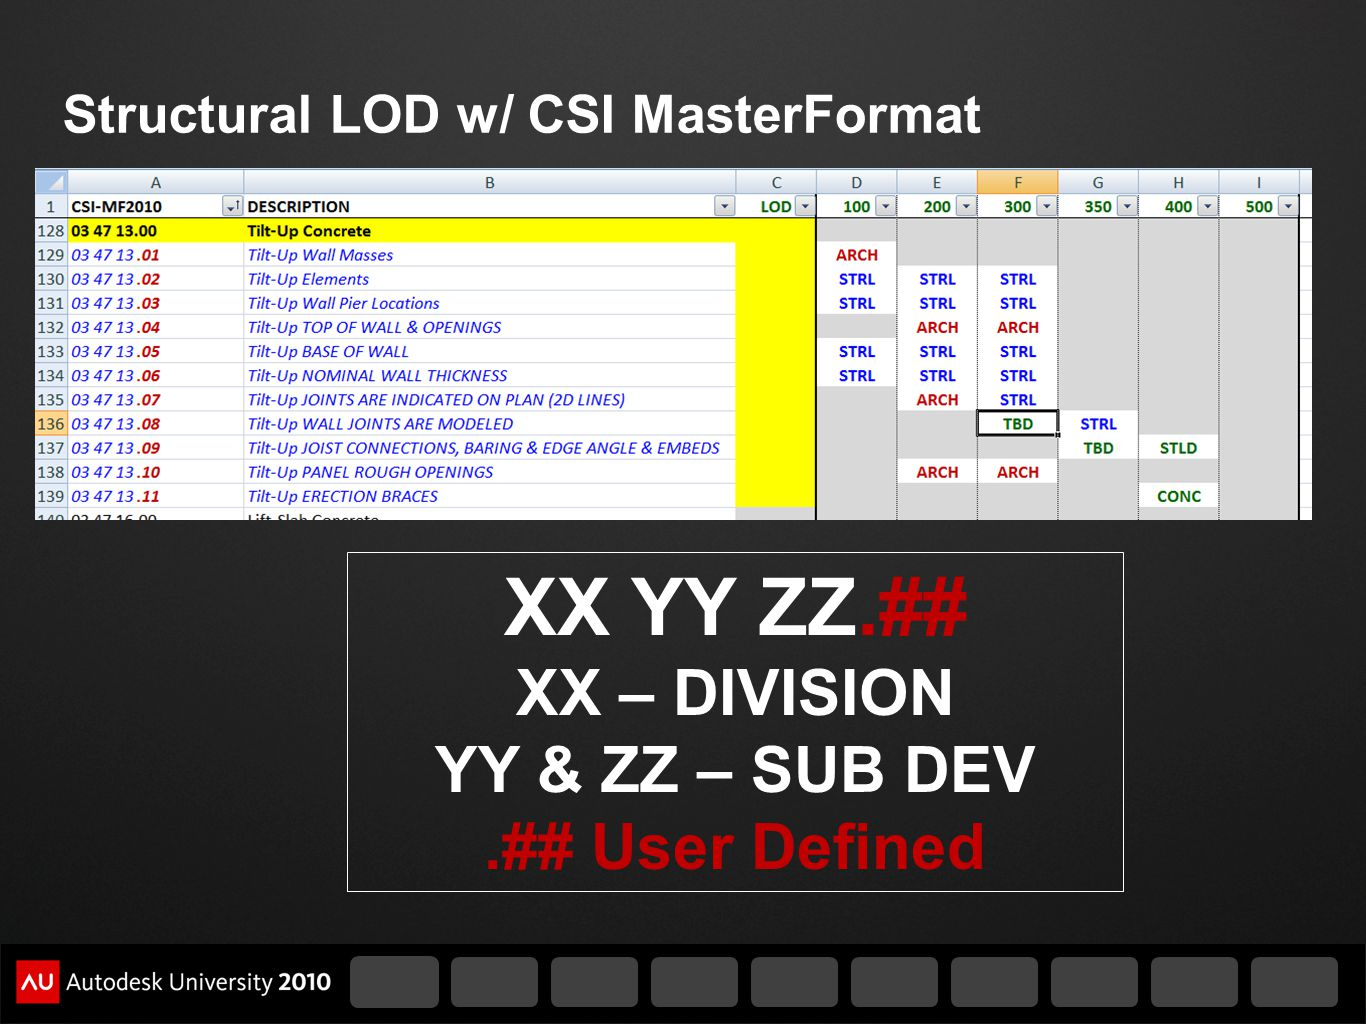 Structural LOD w/ CSI MasterFormat